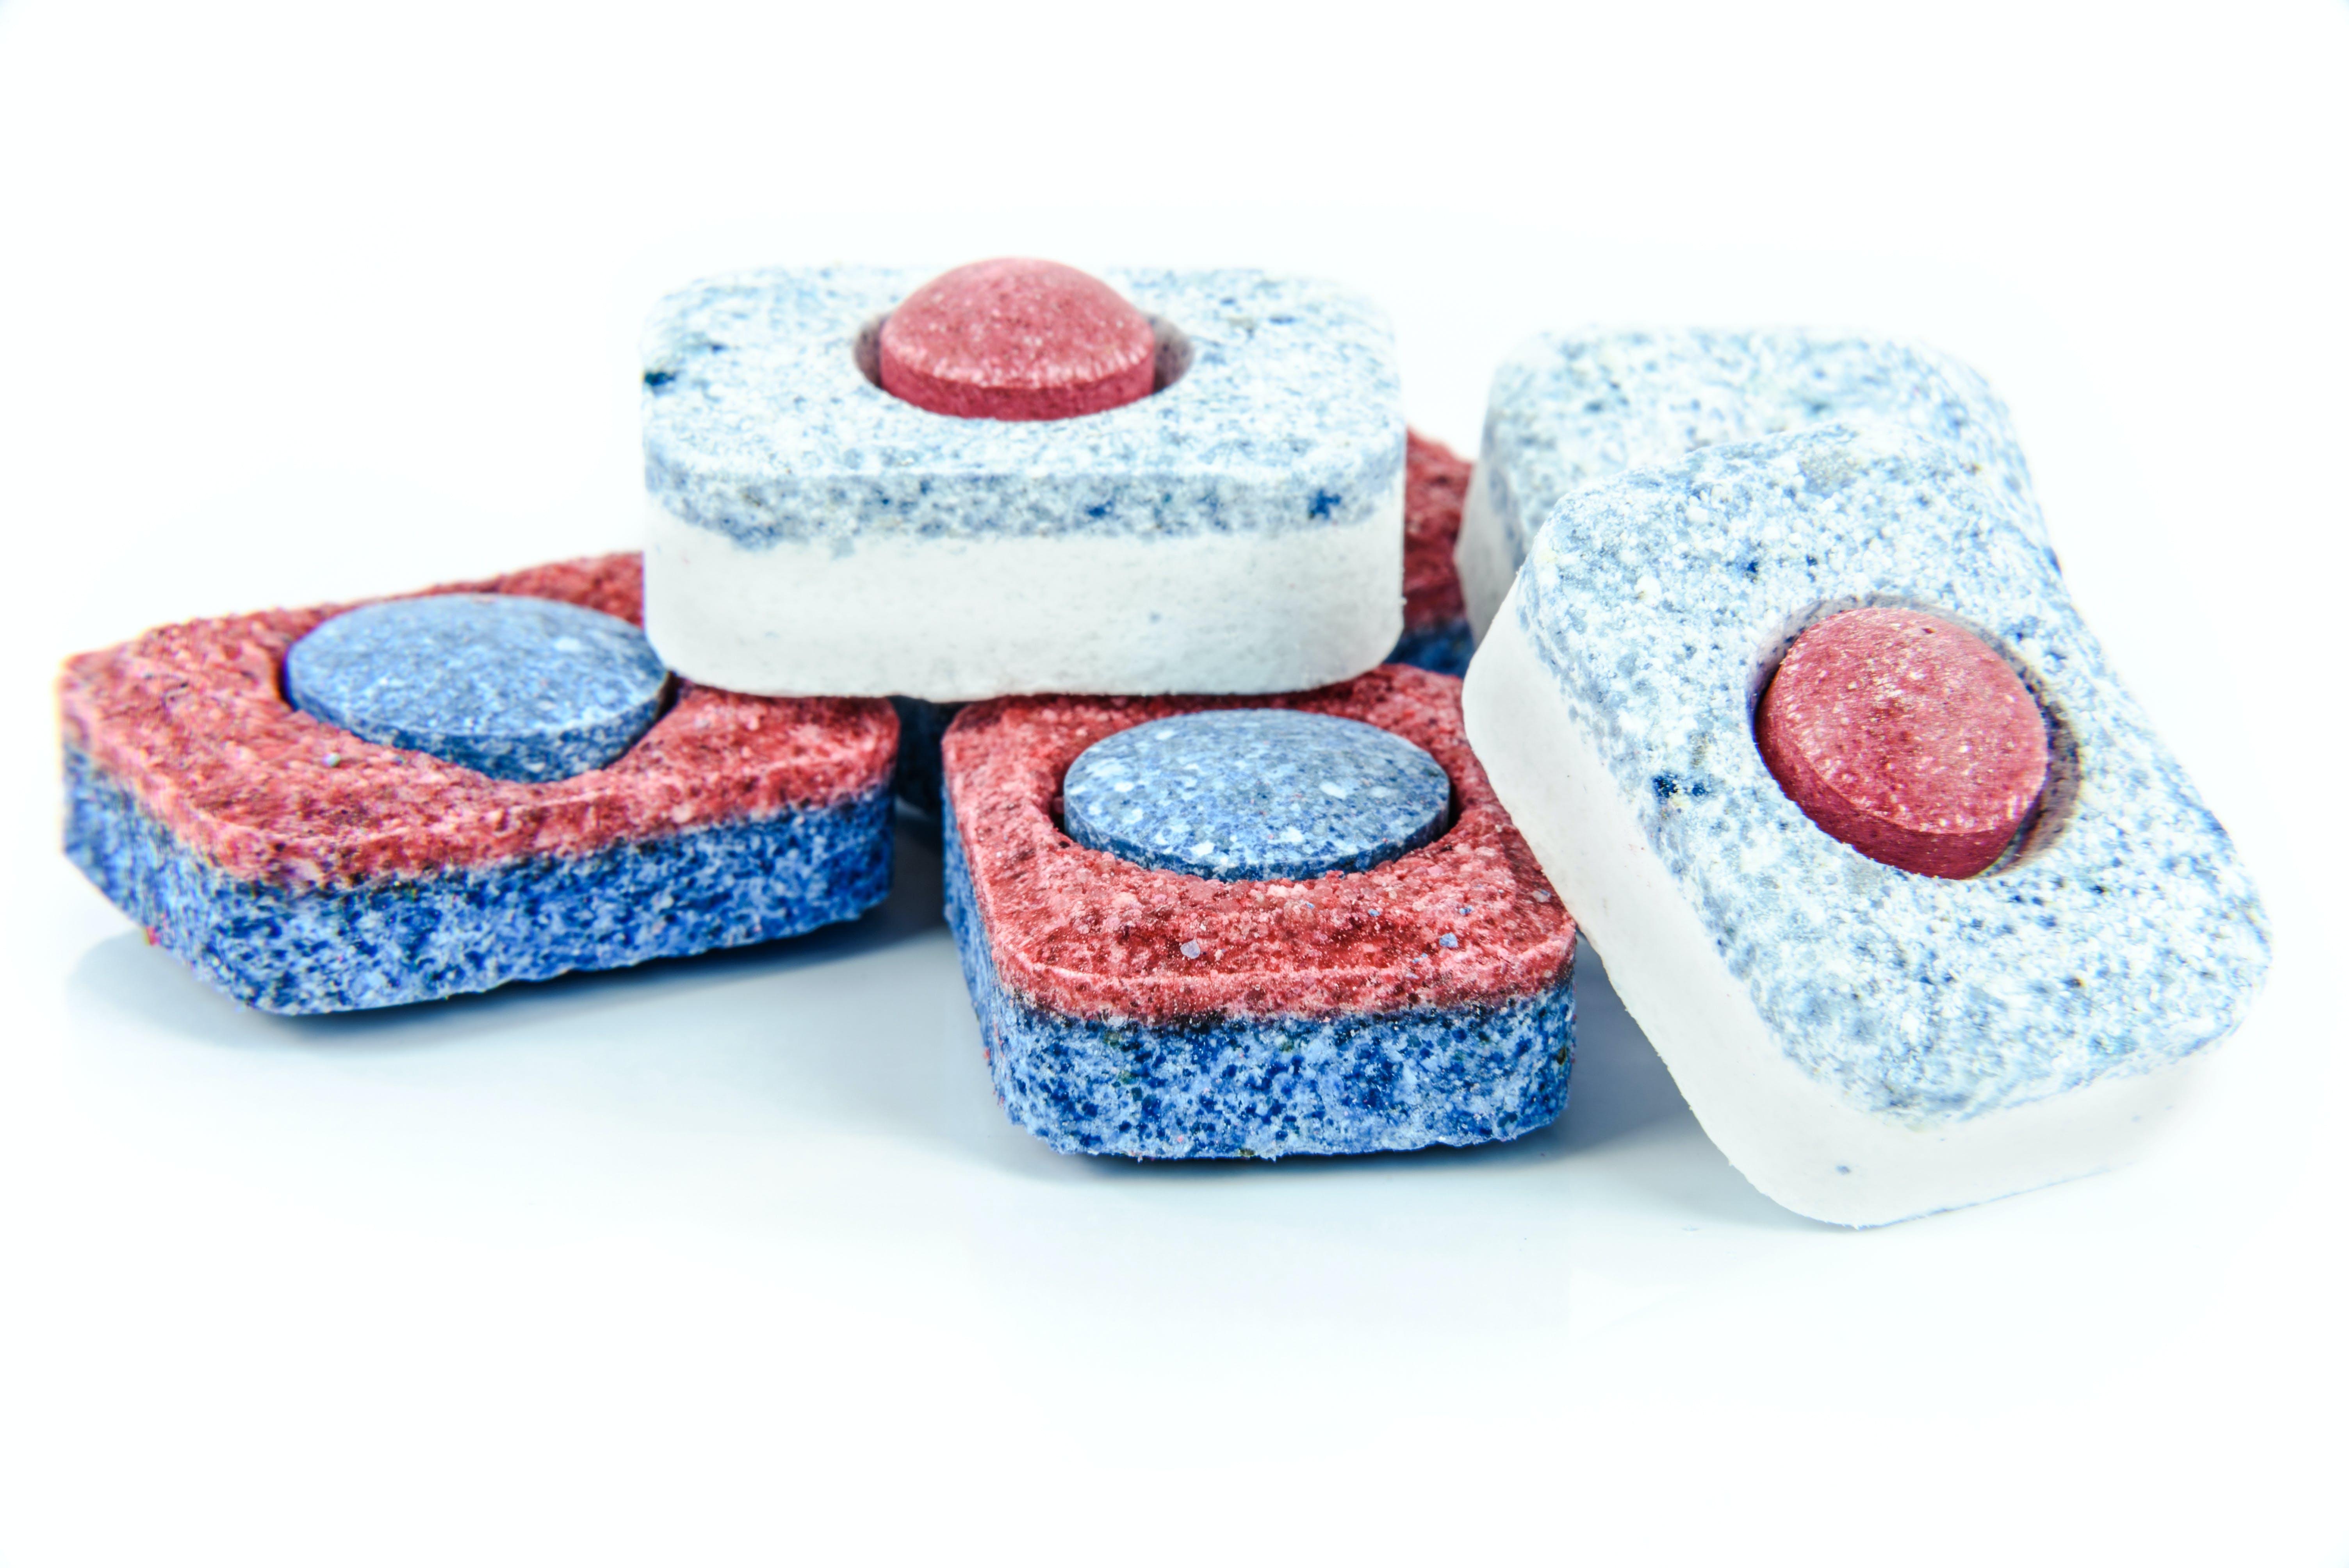 Assorted Soap Bars